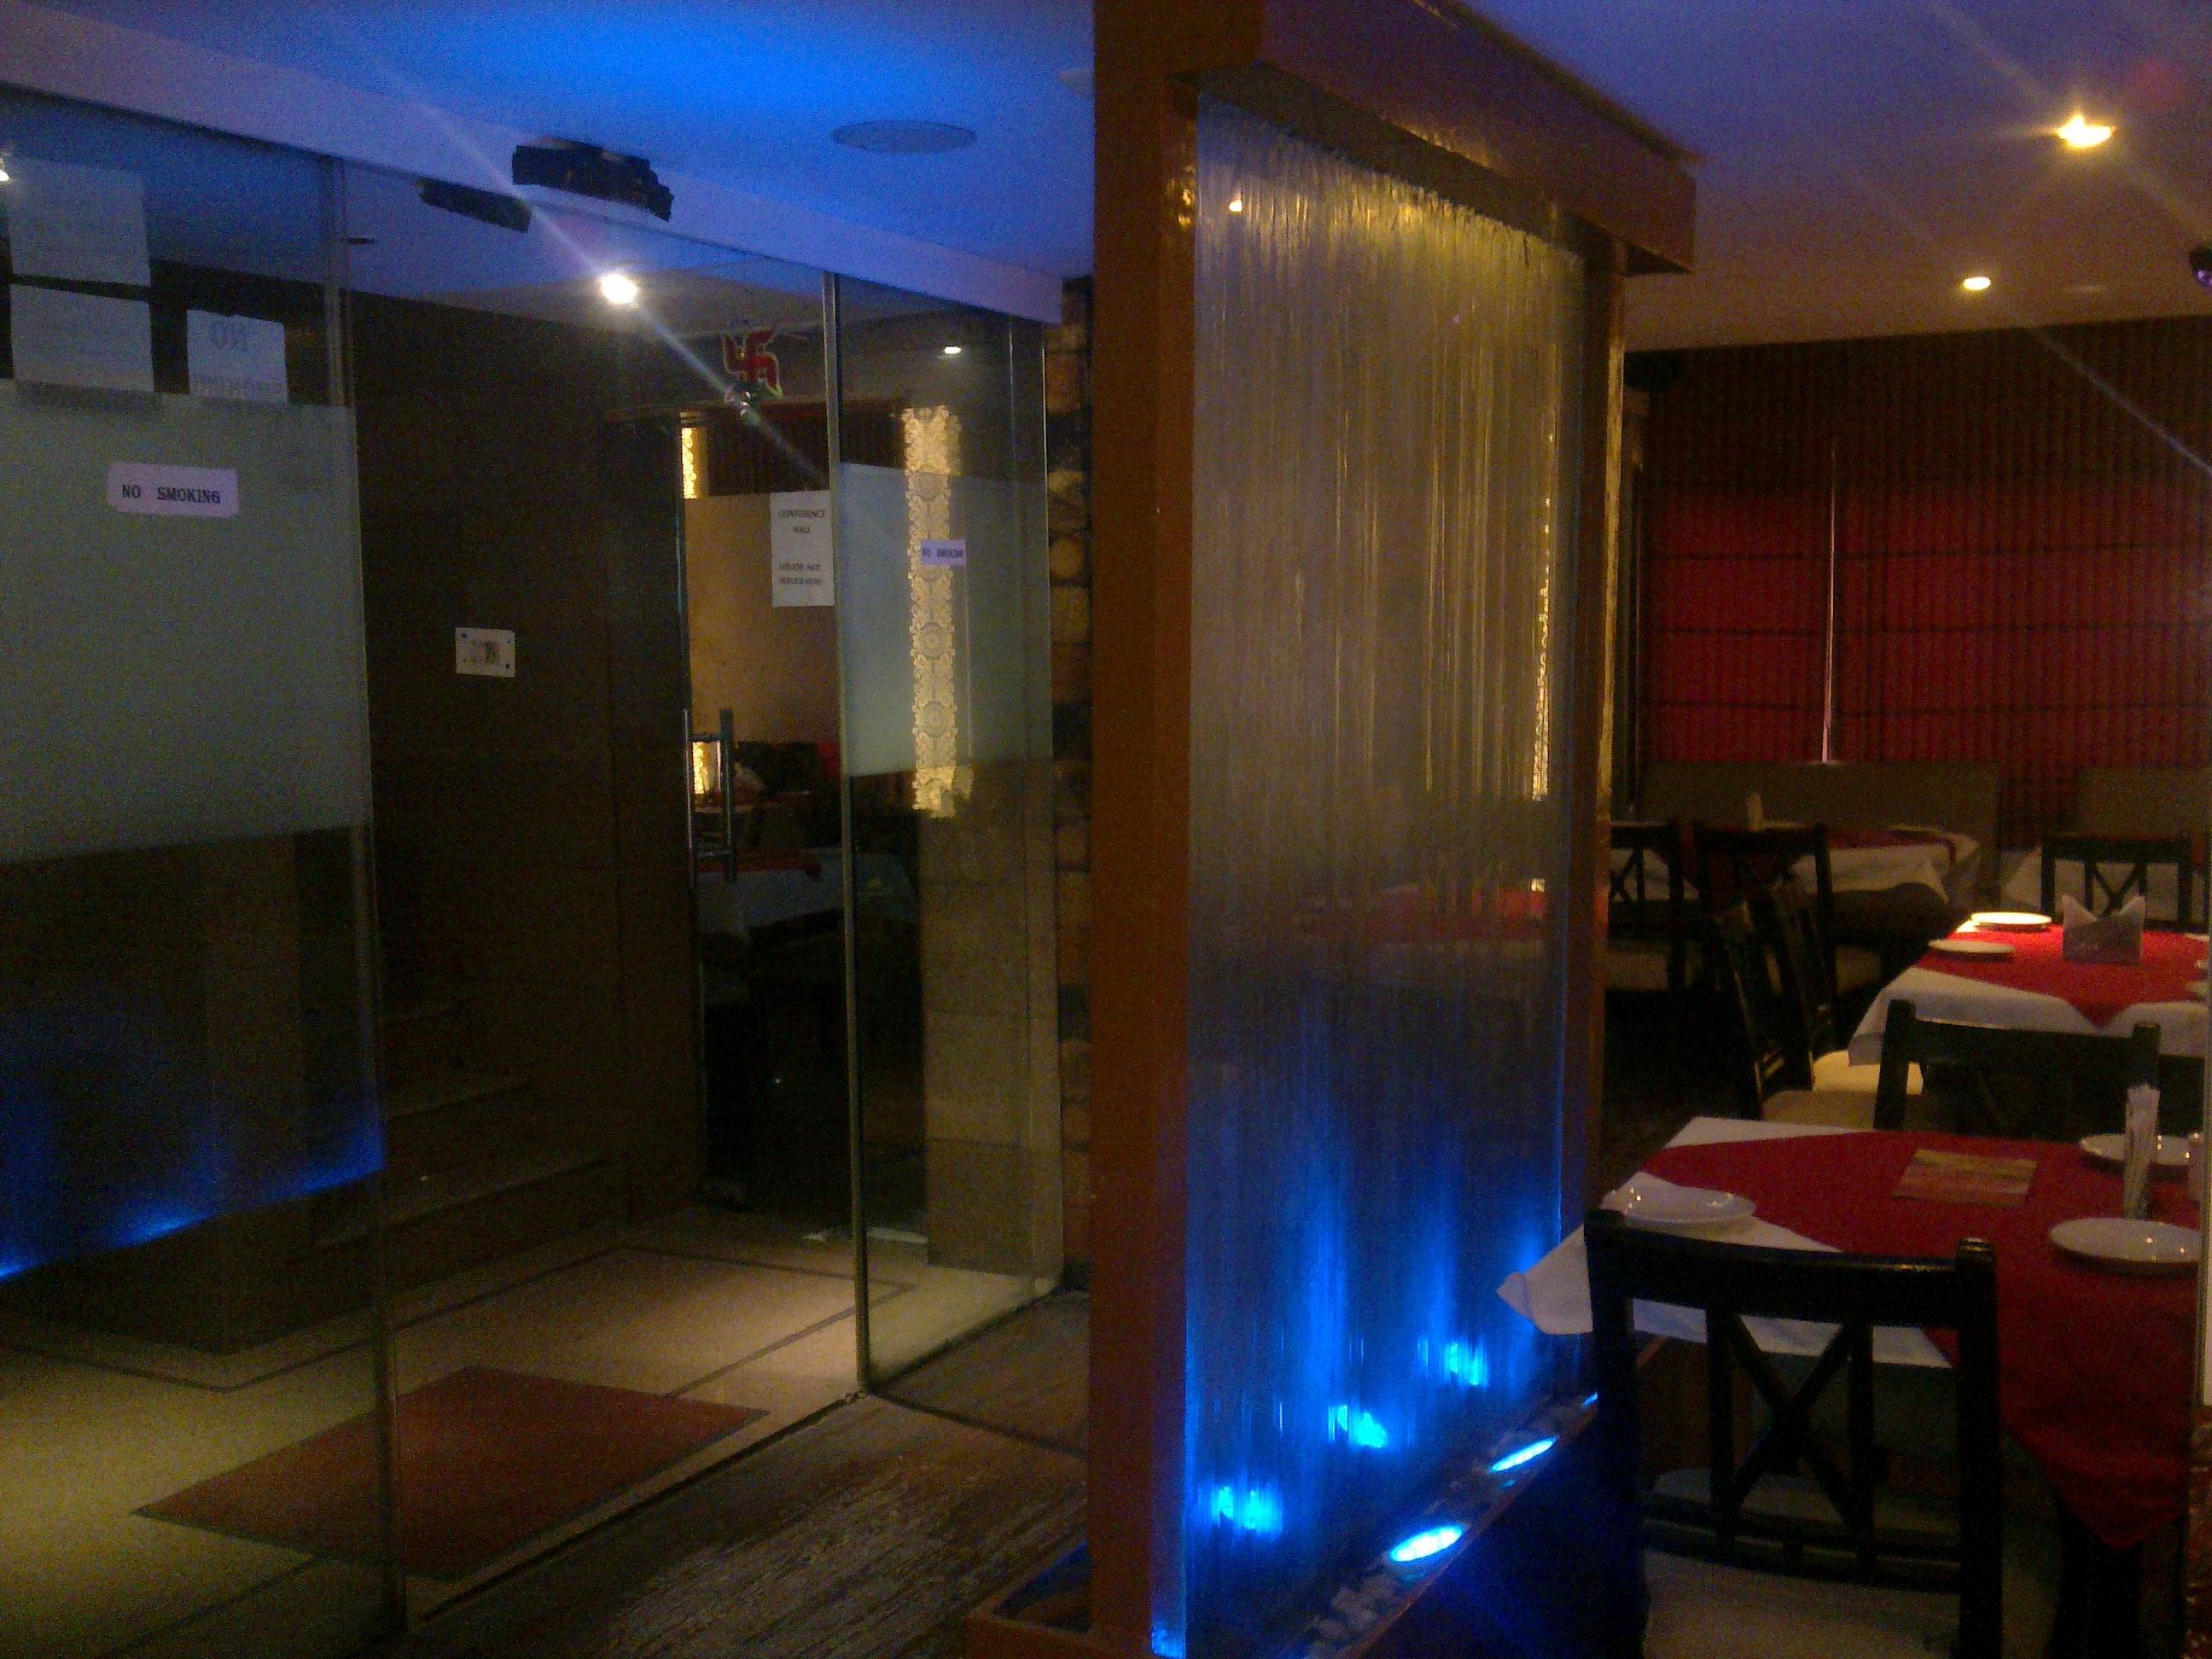 Nile Bar and Restaurant - Ashok Vihar Phase 1 - Delhi NCR Image